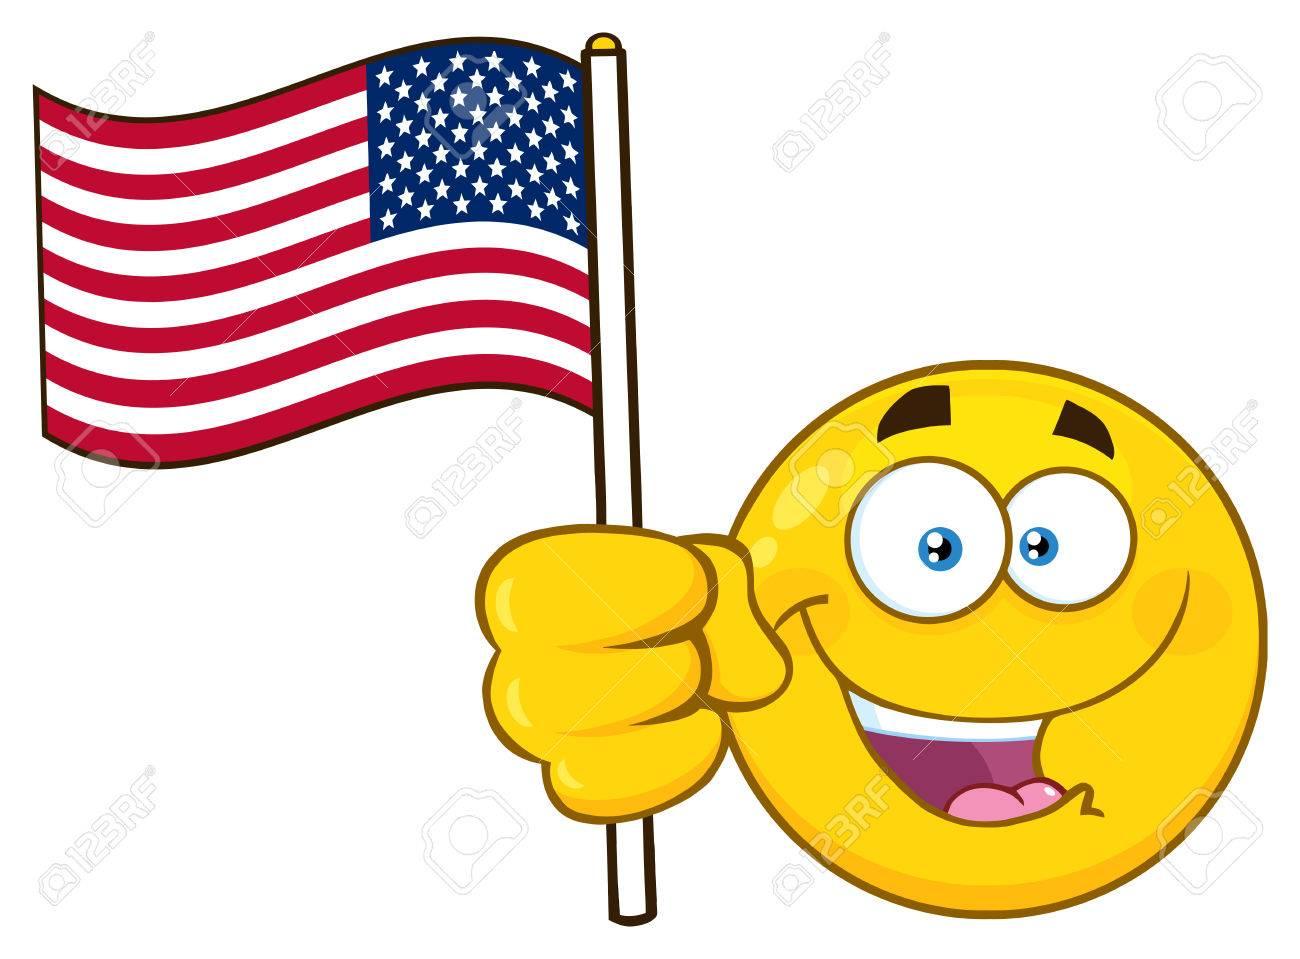 patriotic yellow cartoon emoji face character waving an american rh 123rf com Thumbs Up Emoji Thumbs Up Funny Face